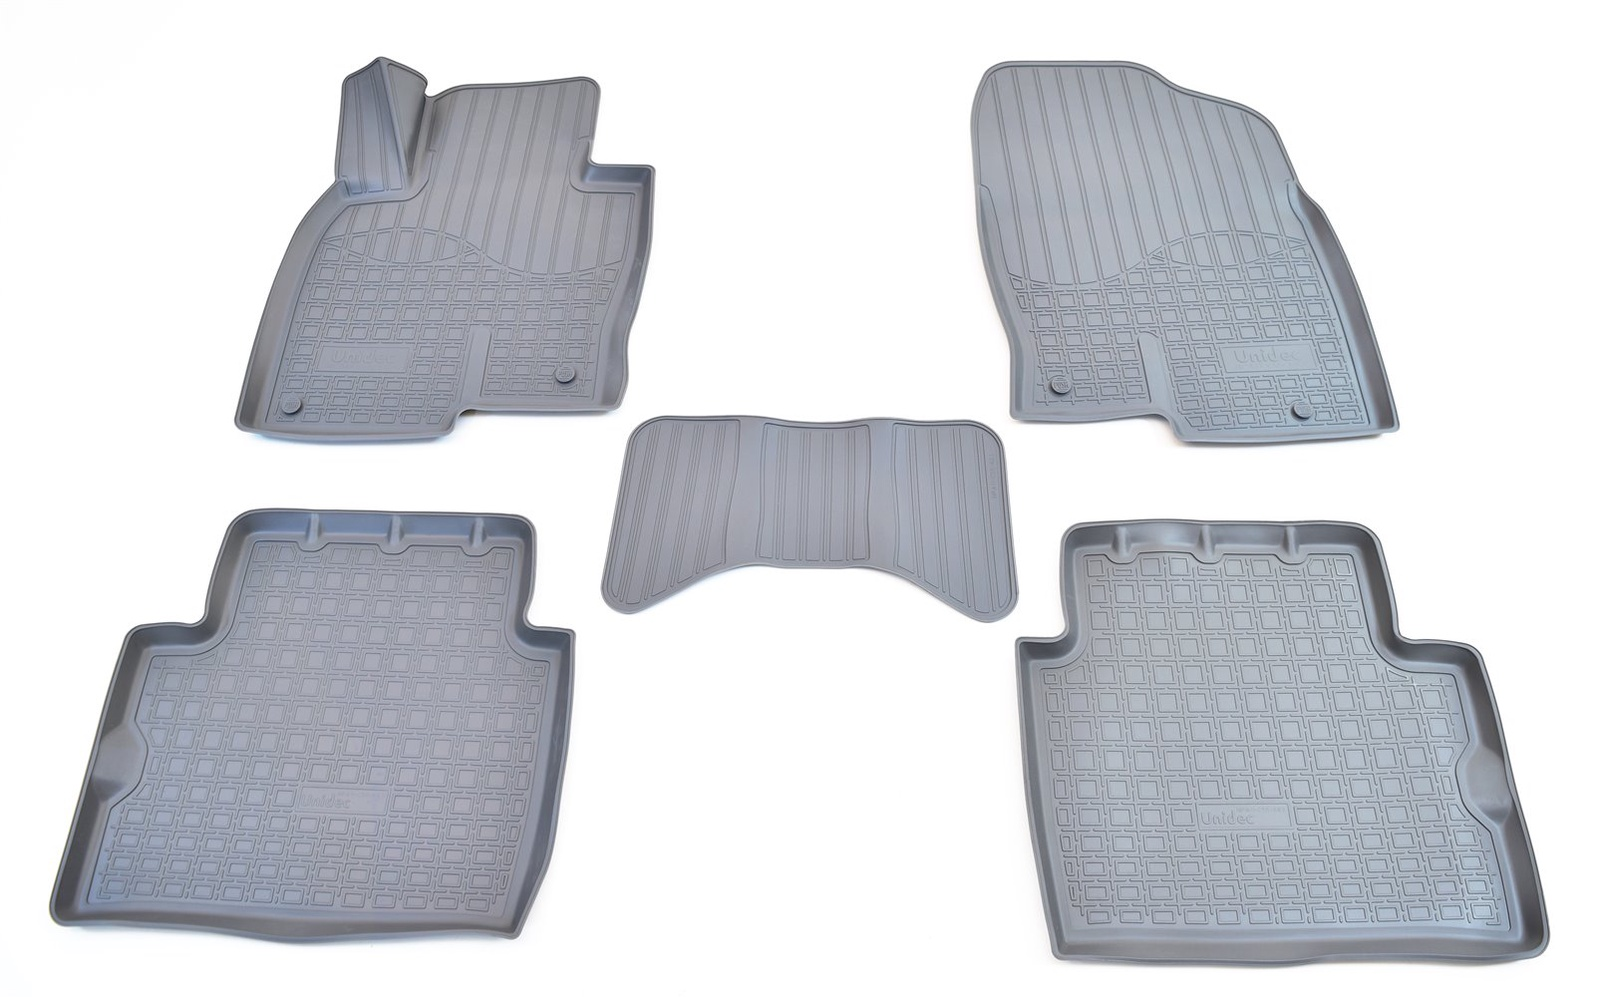 купить Коврики в салон автомобиля Norplast для Mazda CX-5 3D (2017), NPA11-C55-683-G, серый по цене 1990 рублей